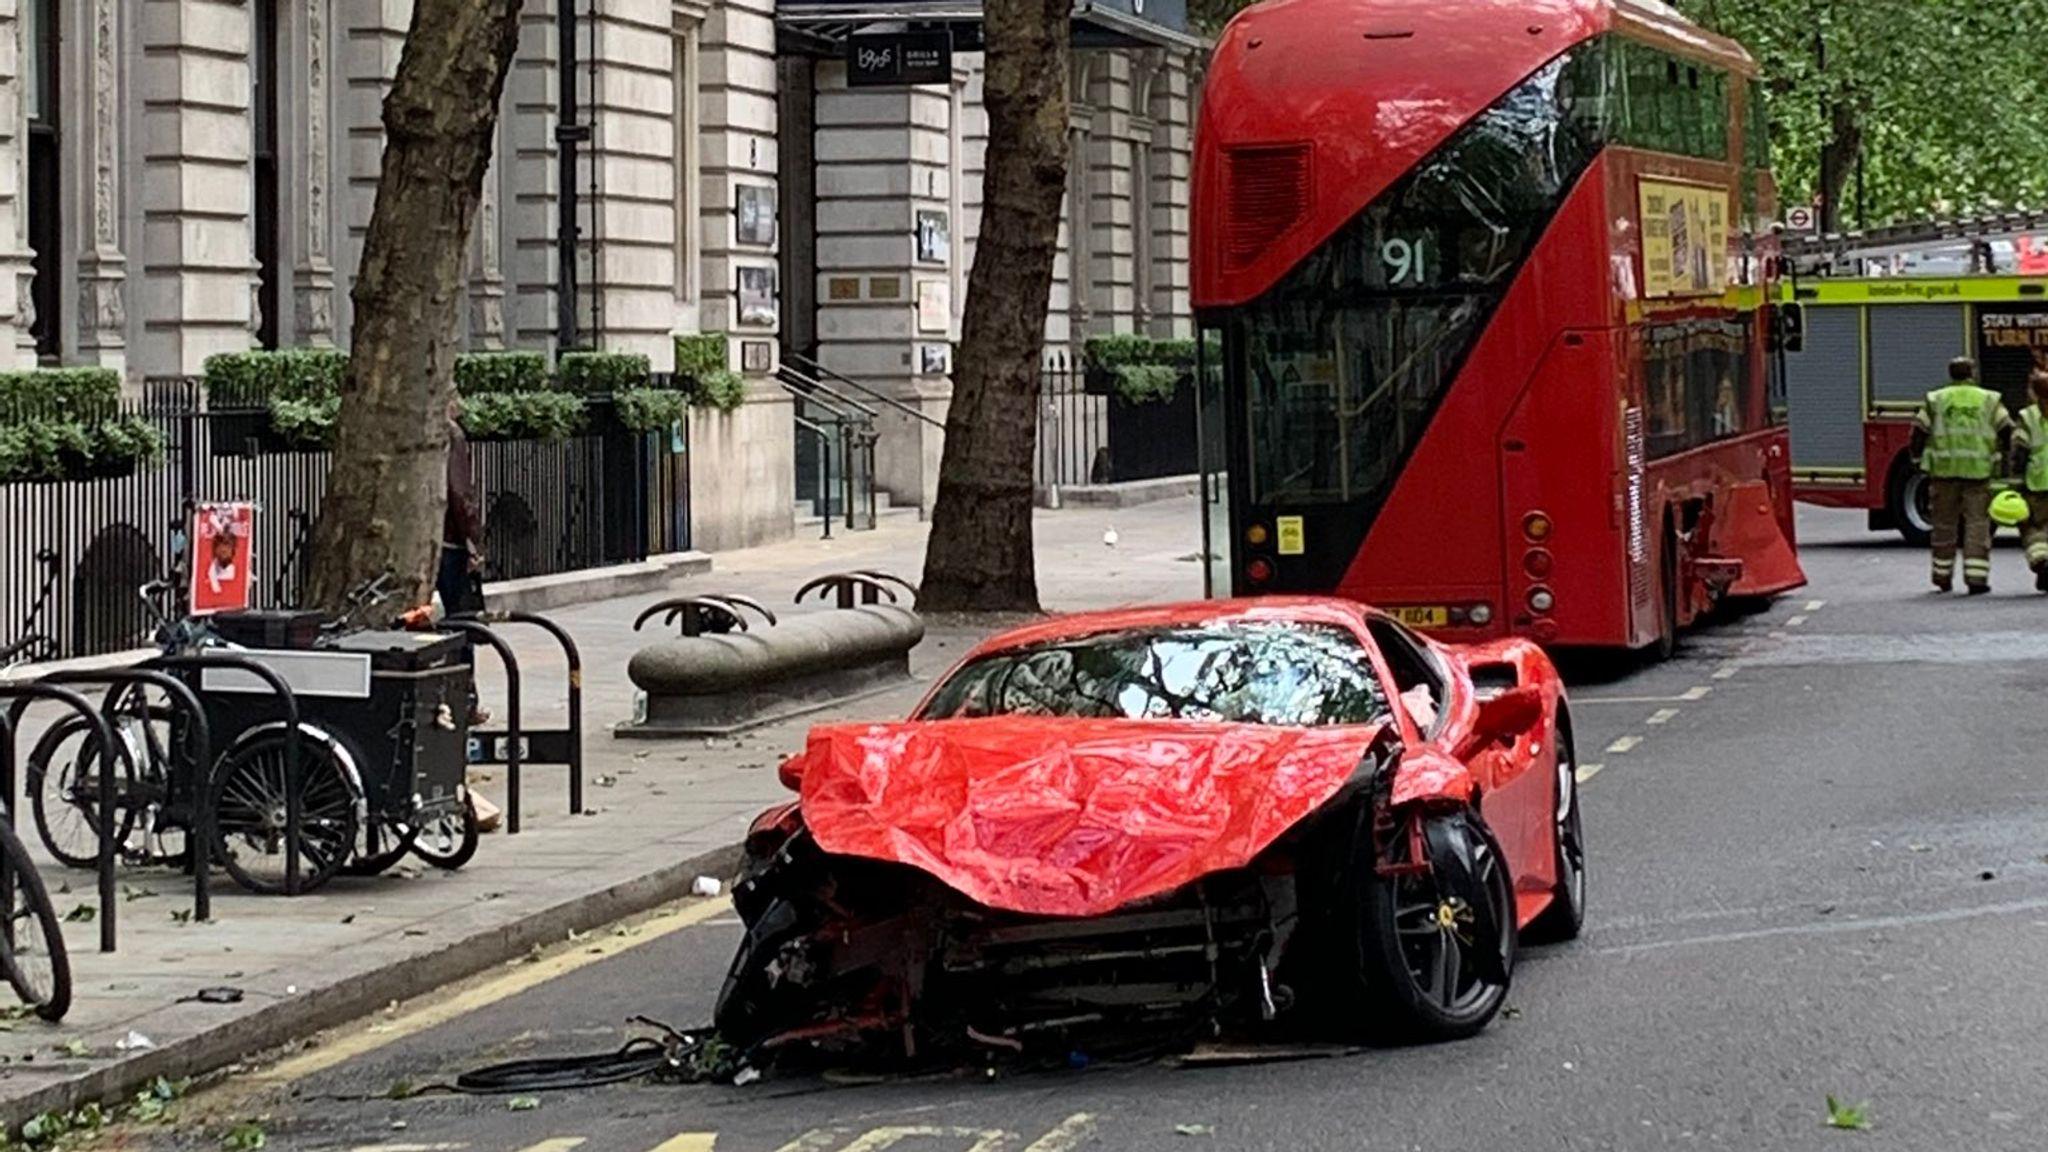 Rapper Swarmz Involved In 250 000 Ferrari Crash With London Bus Uk News Sky News